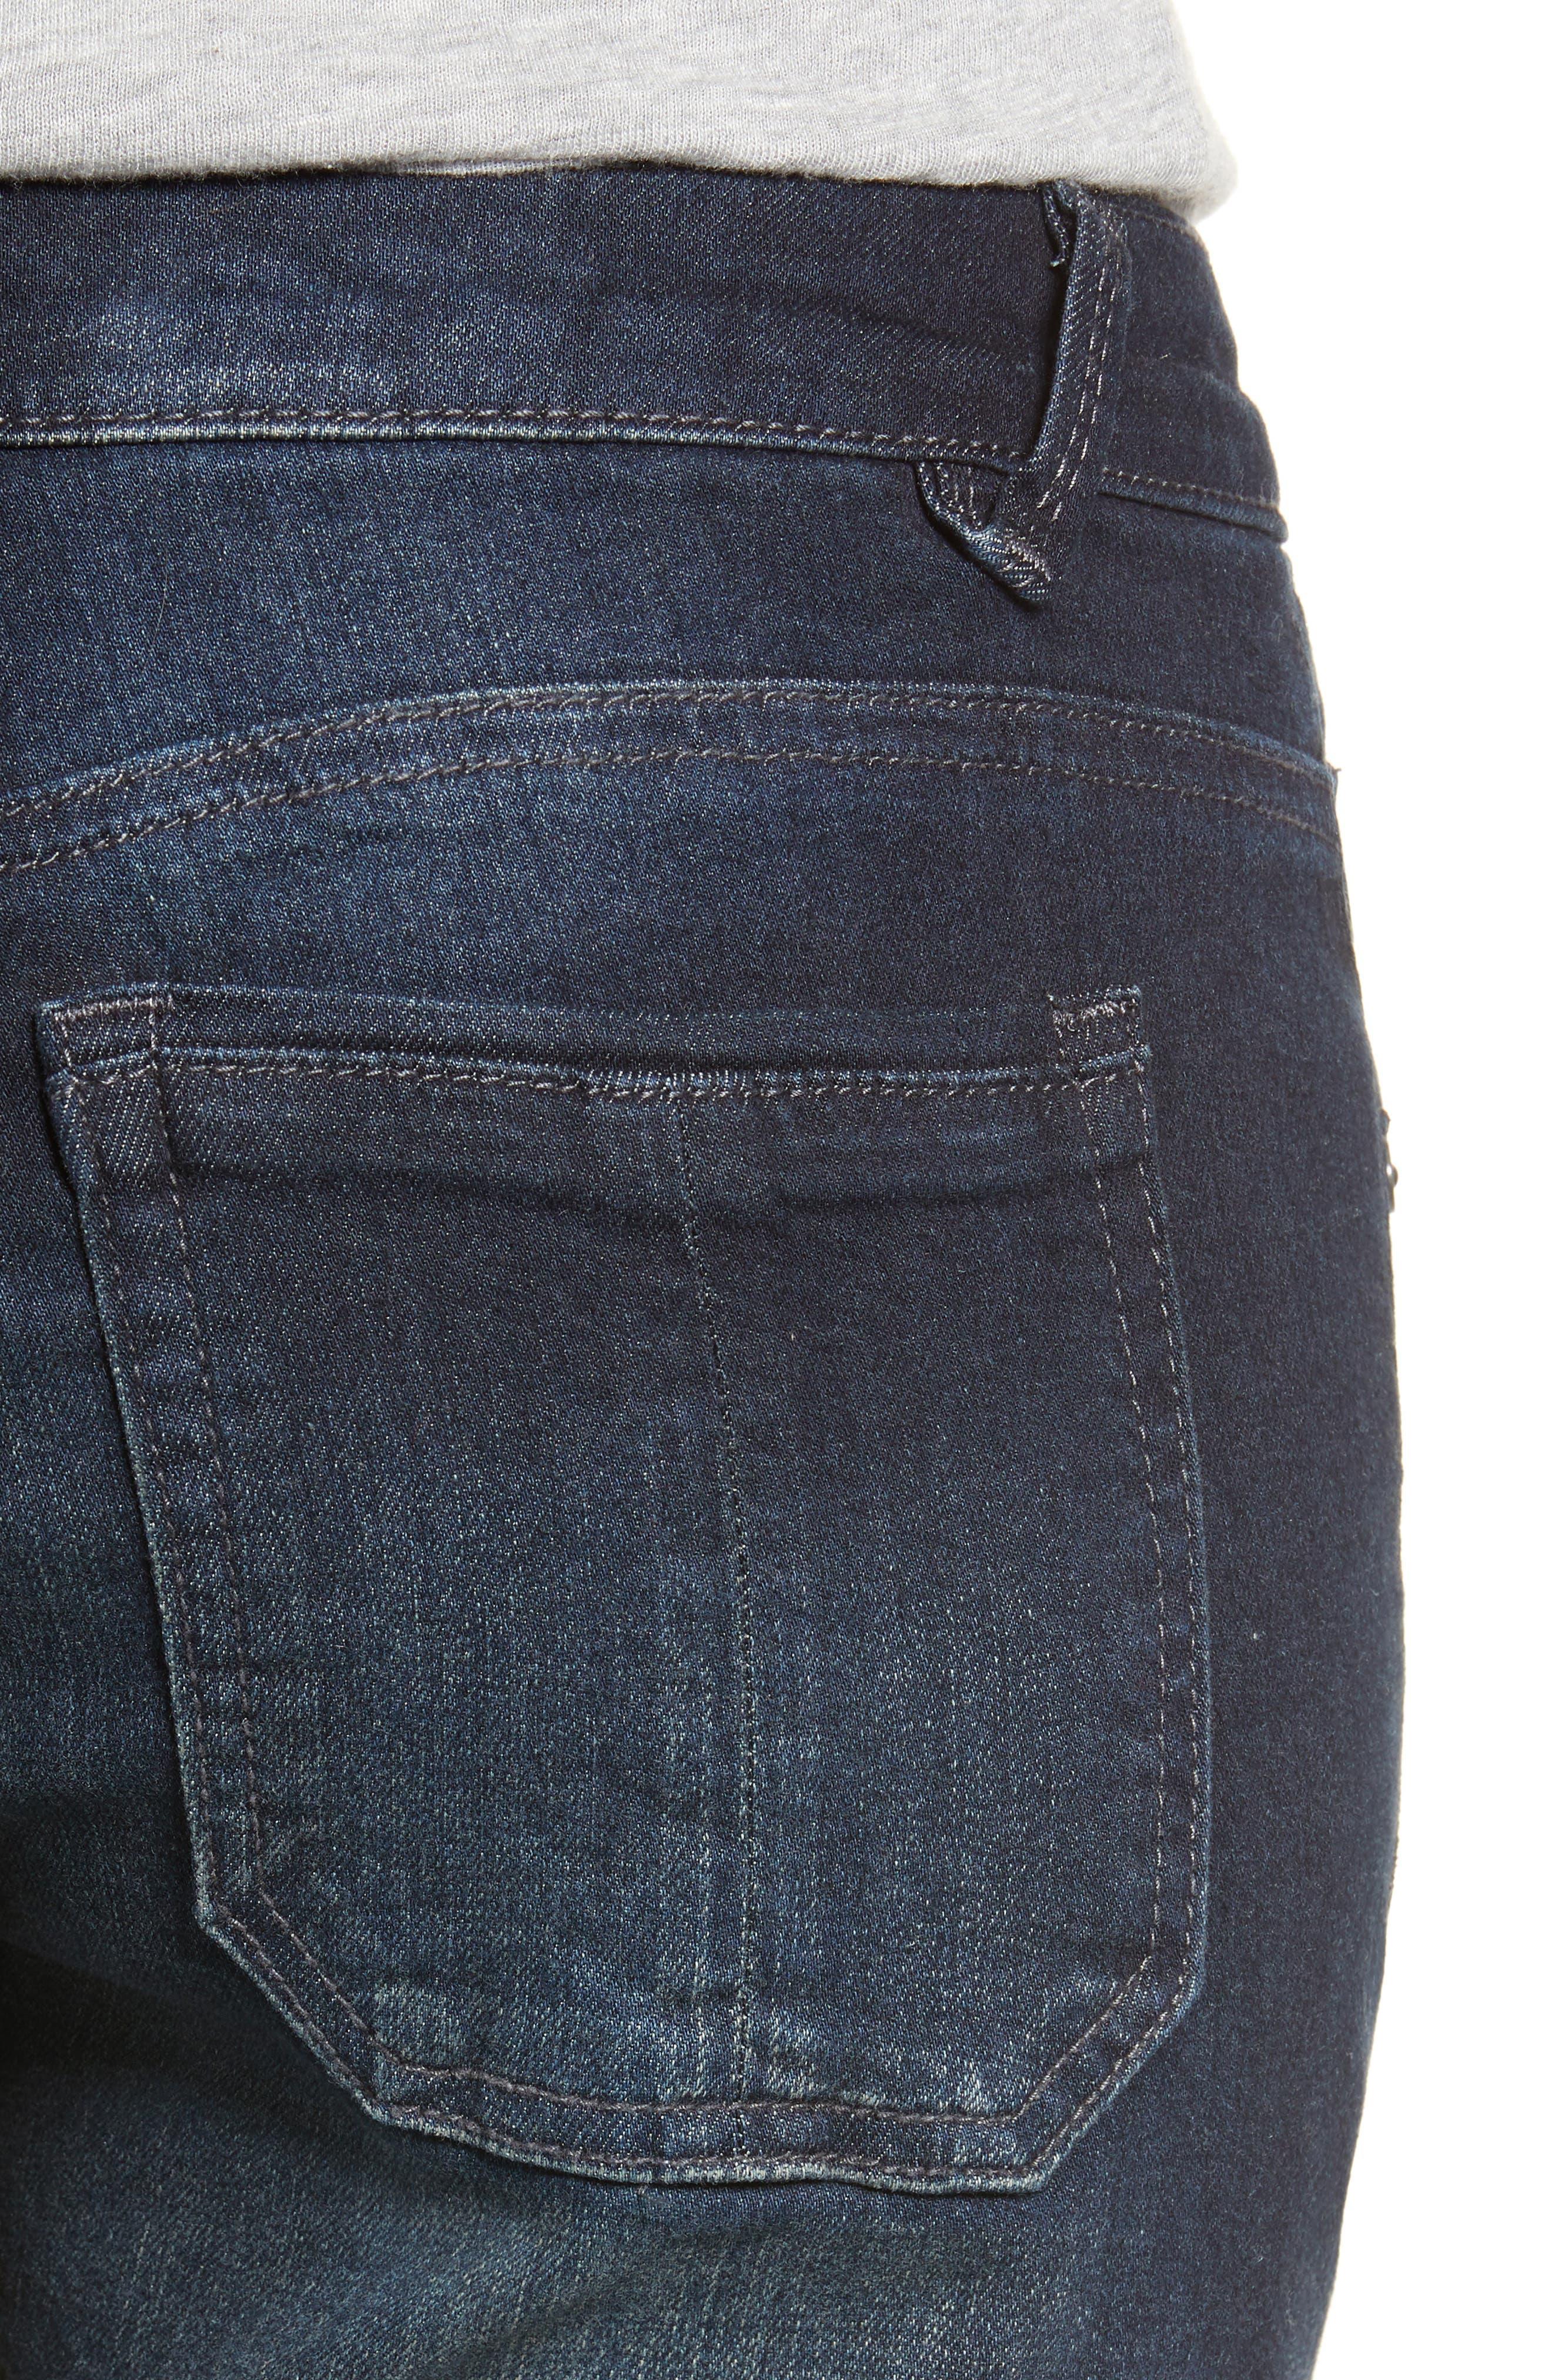 Seamless Ankle Skimmer Jeans,                             Alternate thumbnail 4, color,                             INDIGO